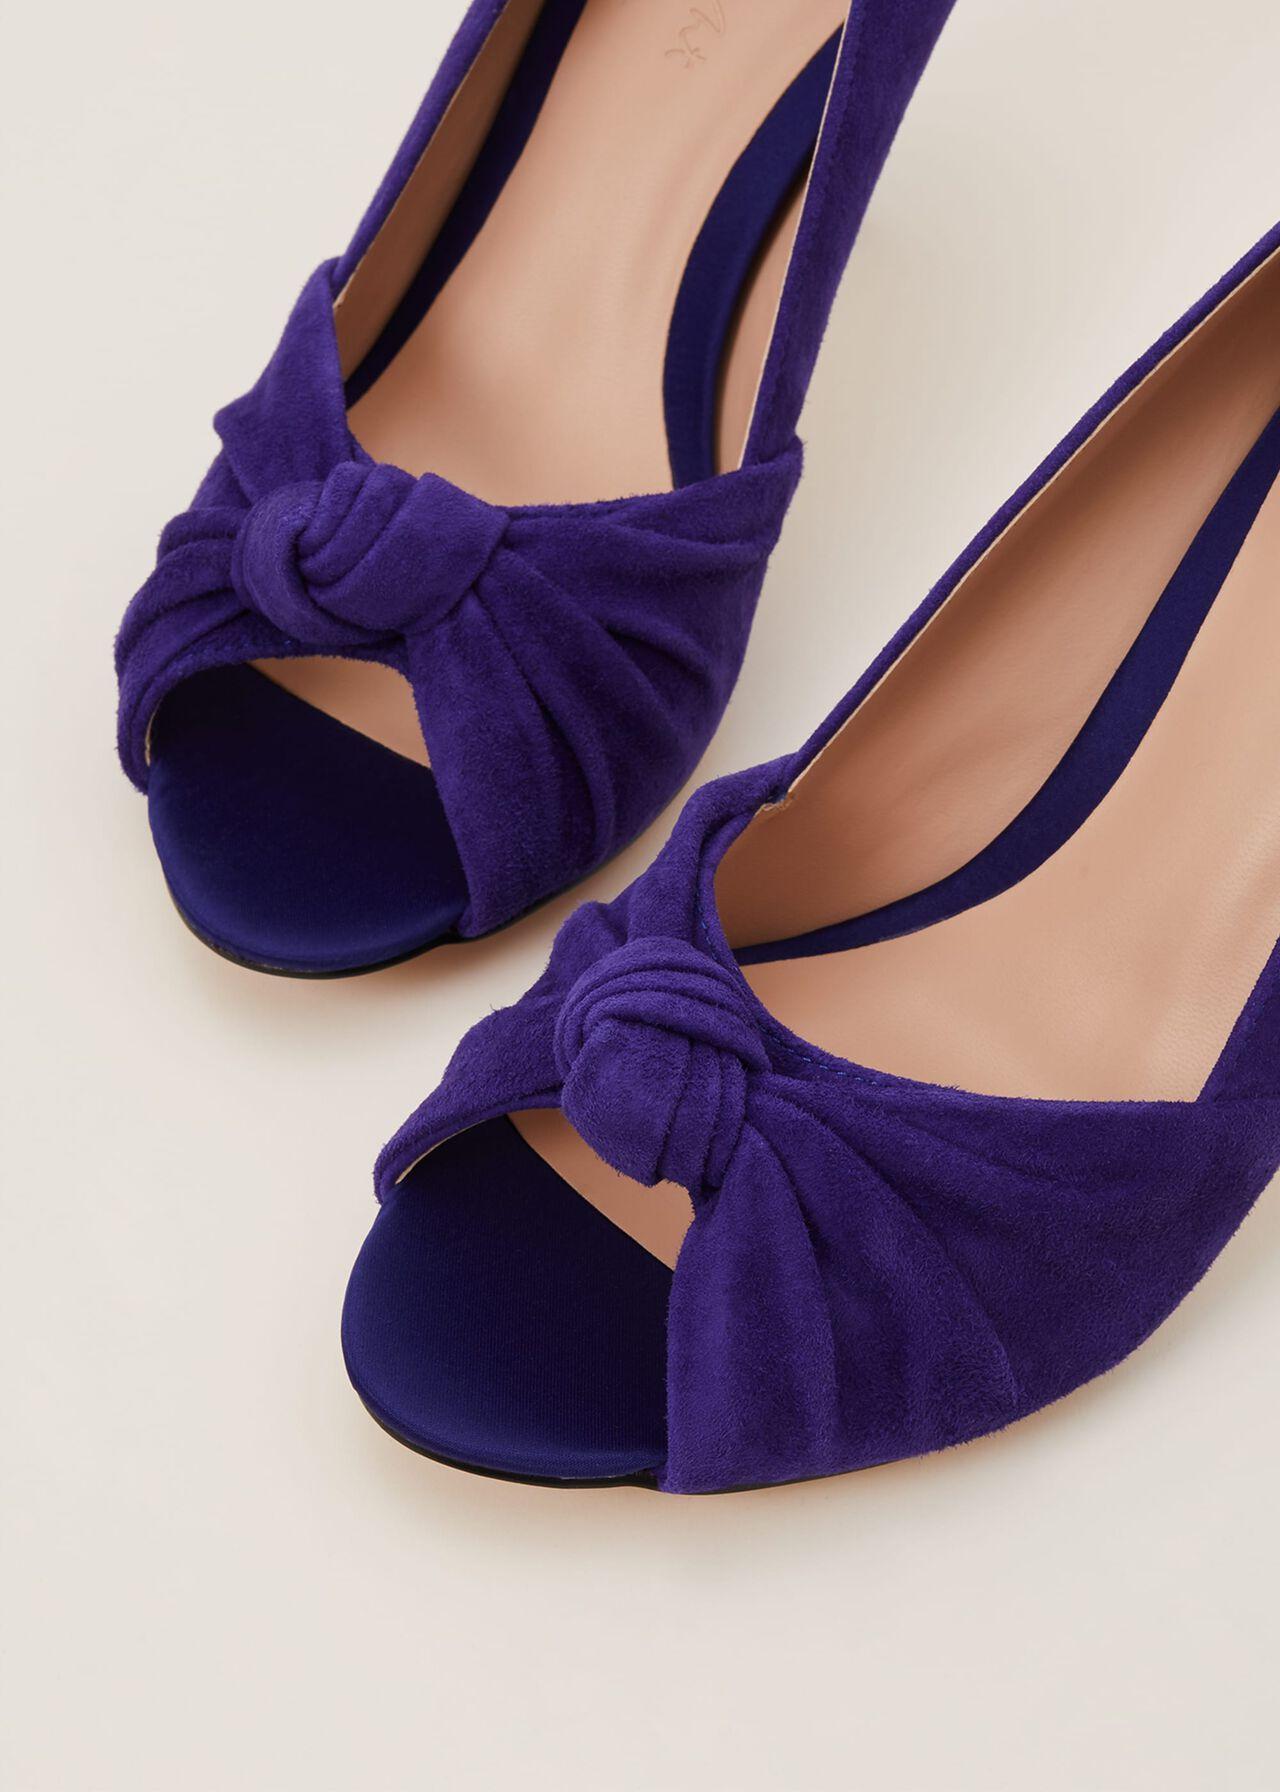 Sonja Knot Front Peep Toe Shoe